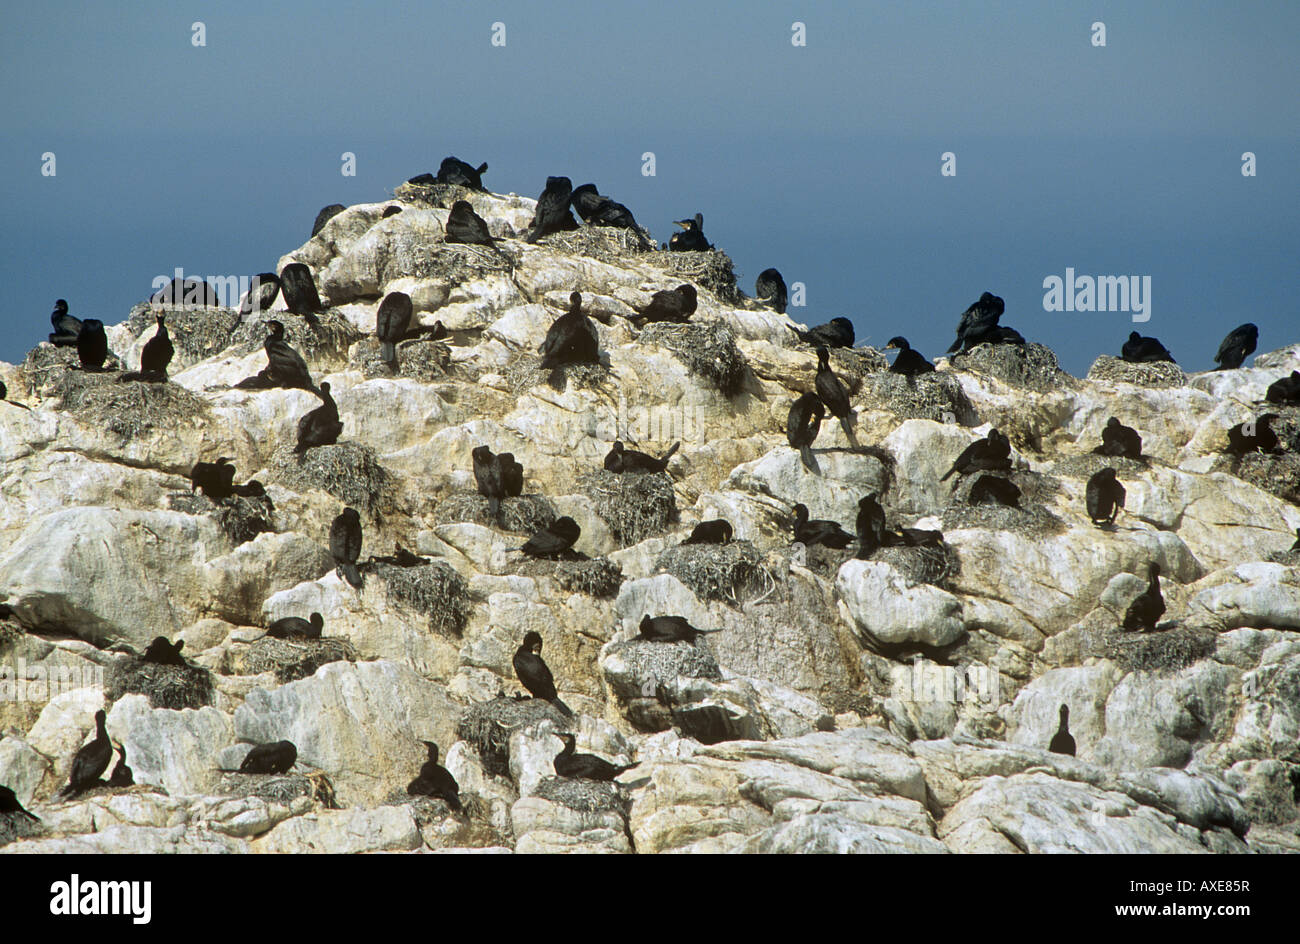 colony of cormorants on rock / Phalacrocorax carbo - Stock Image